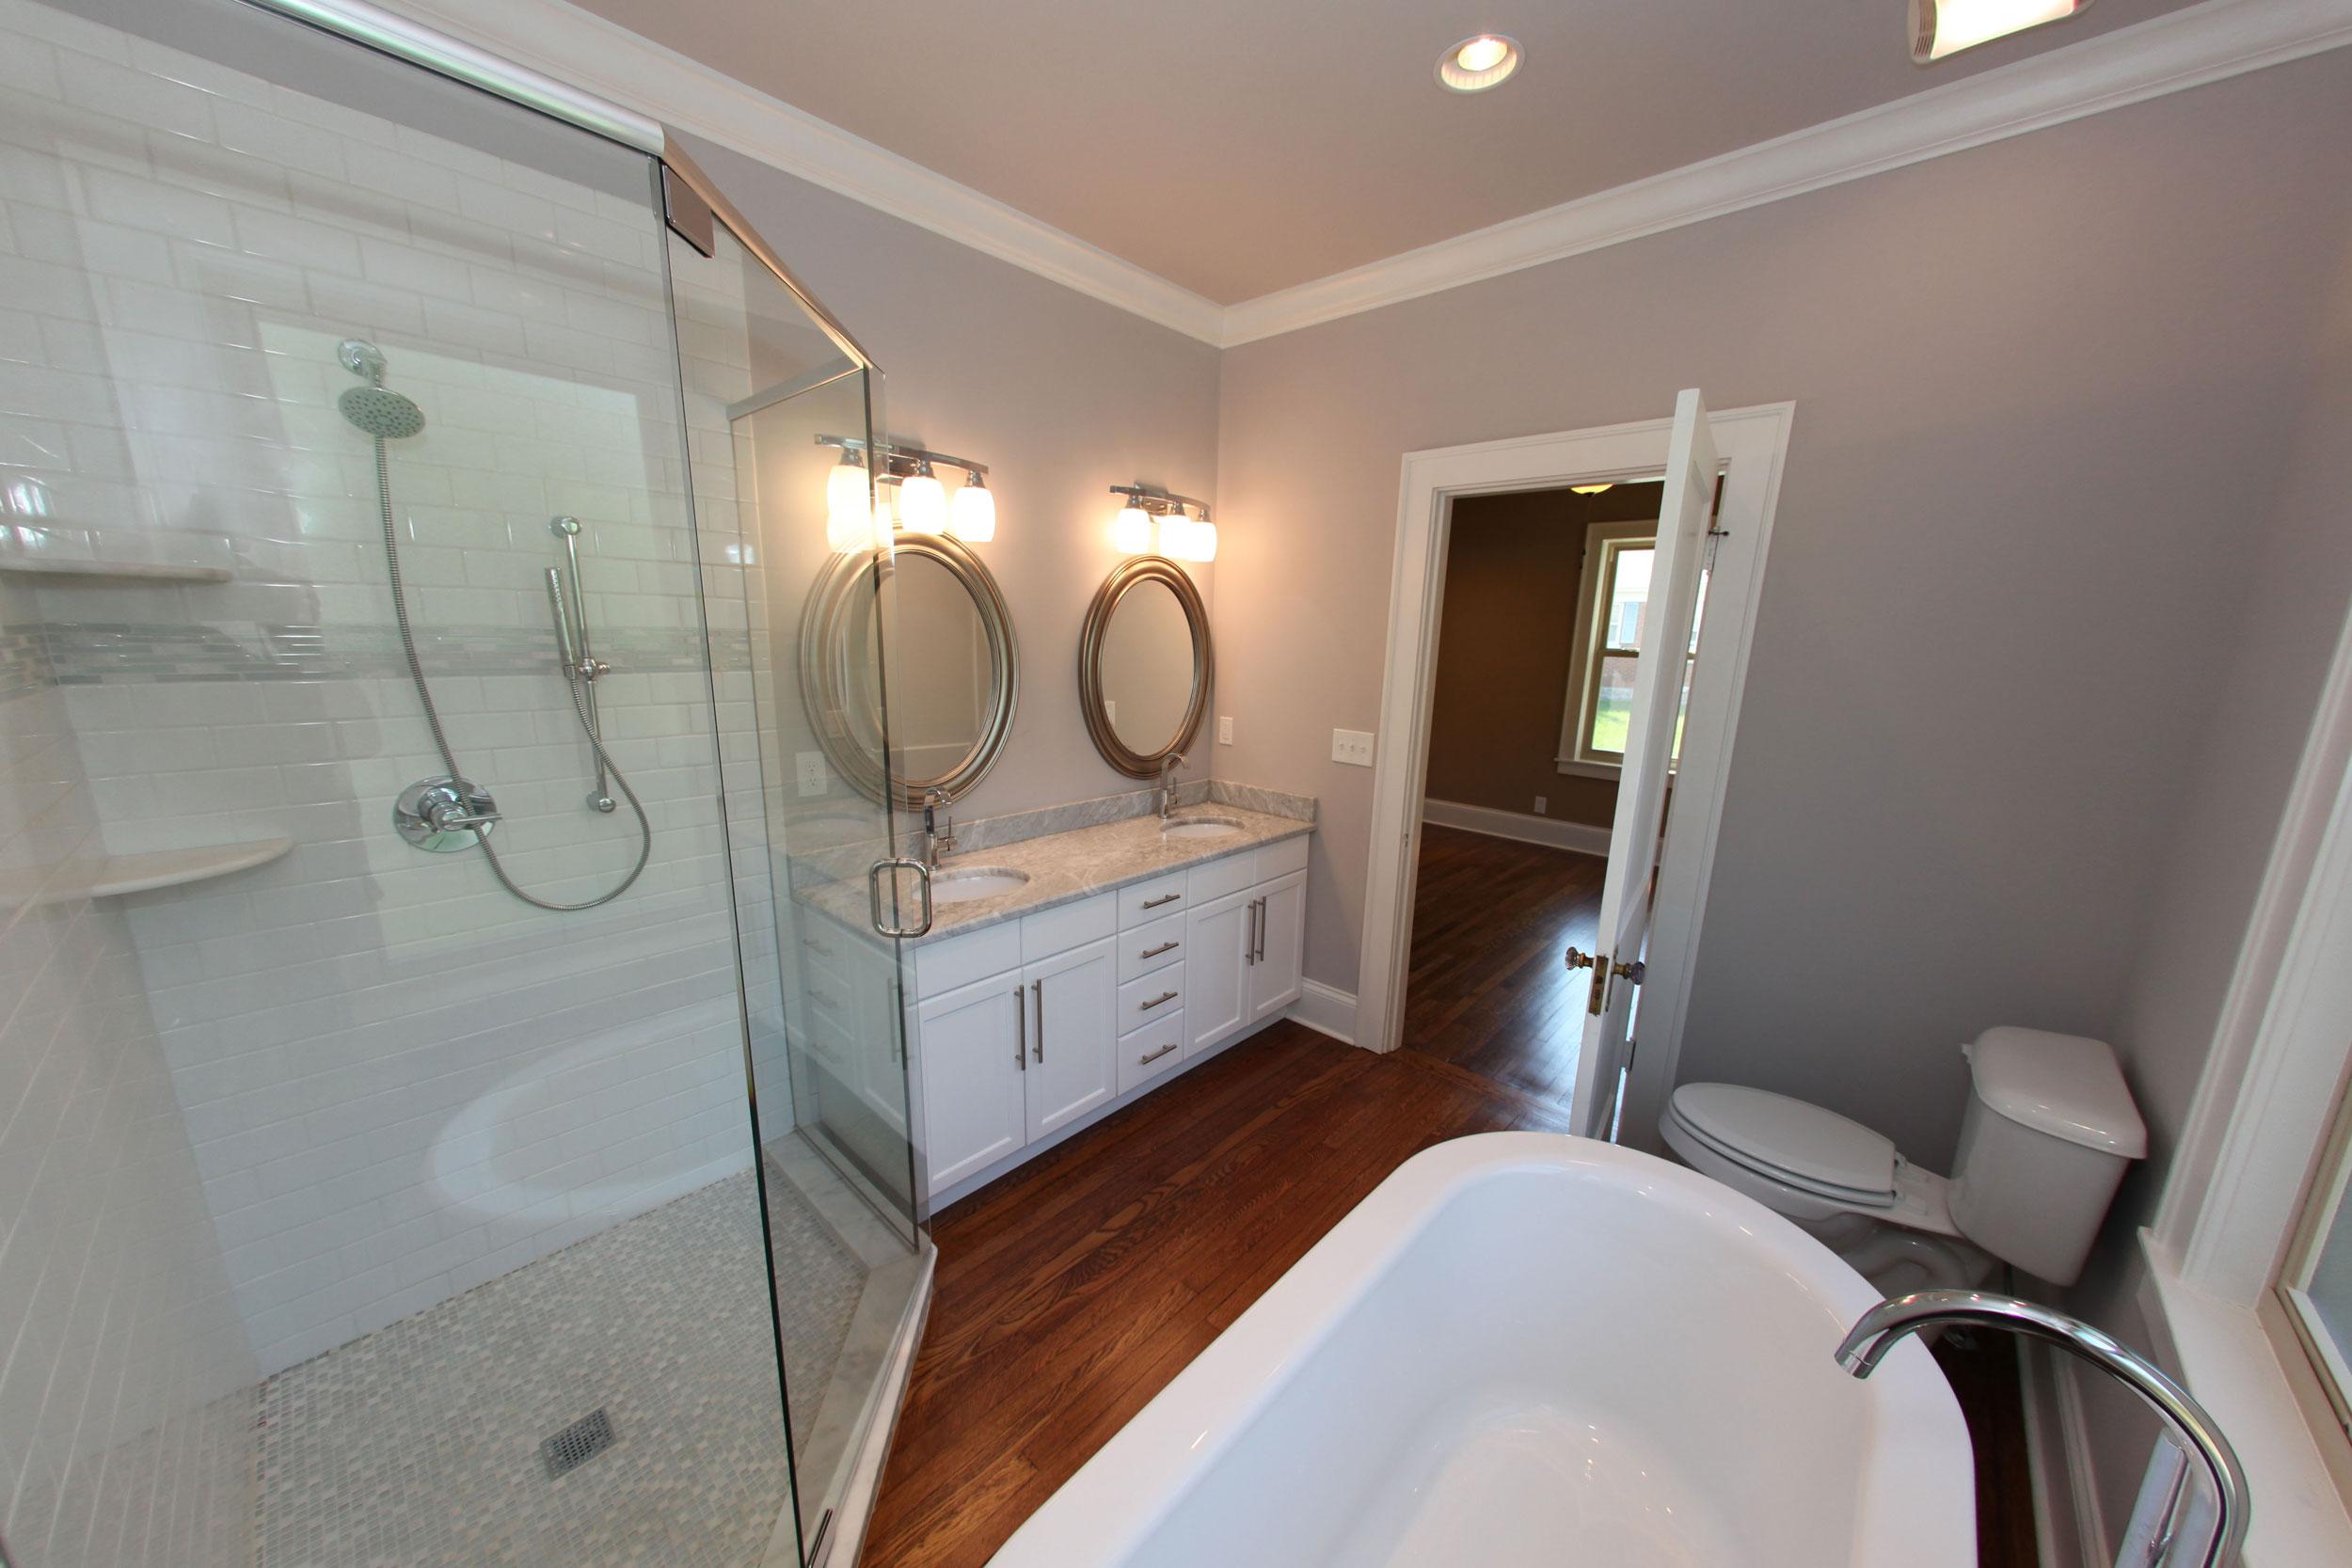 Ridgeway Bathroom